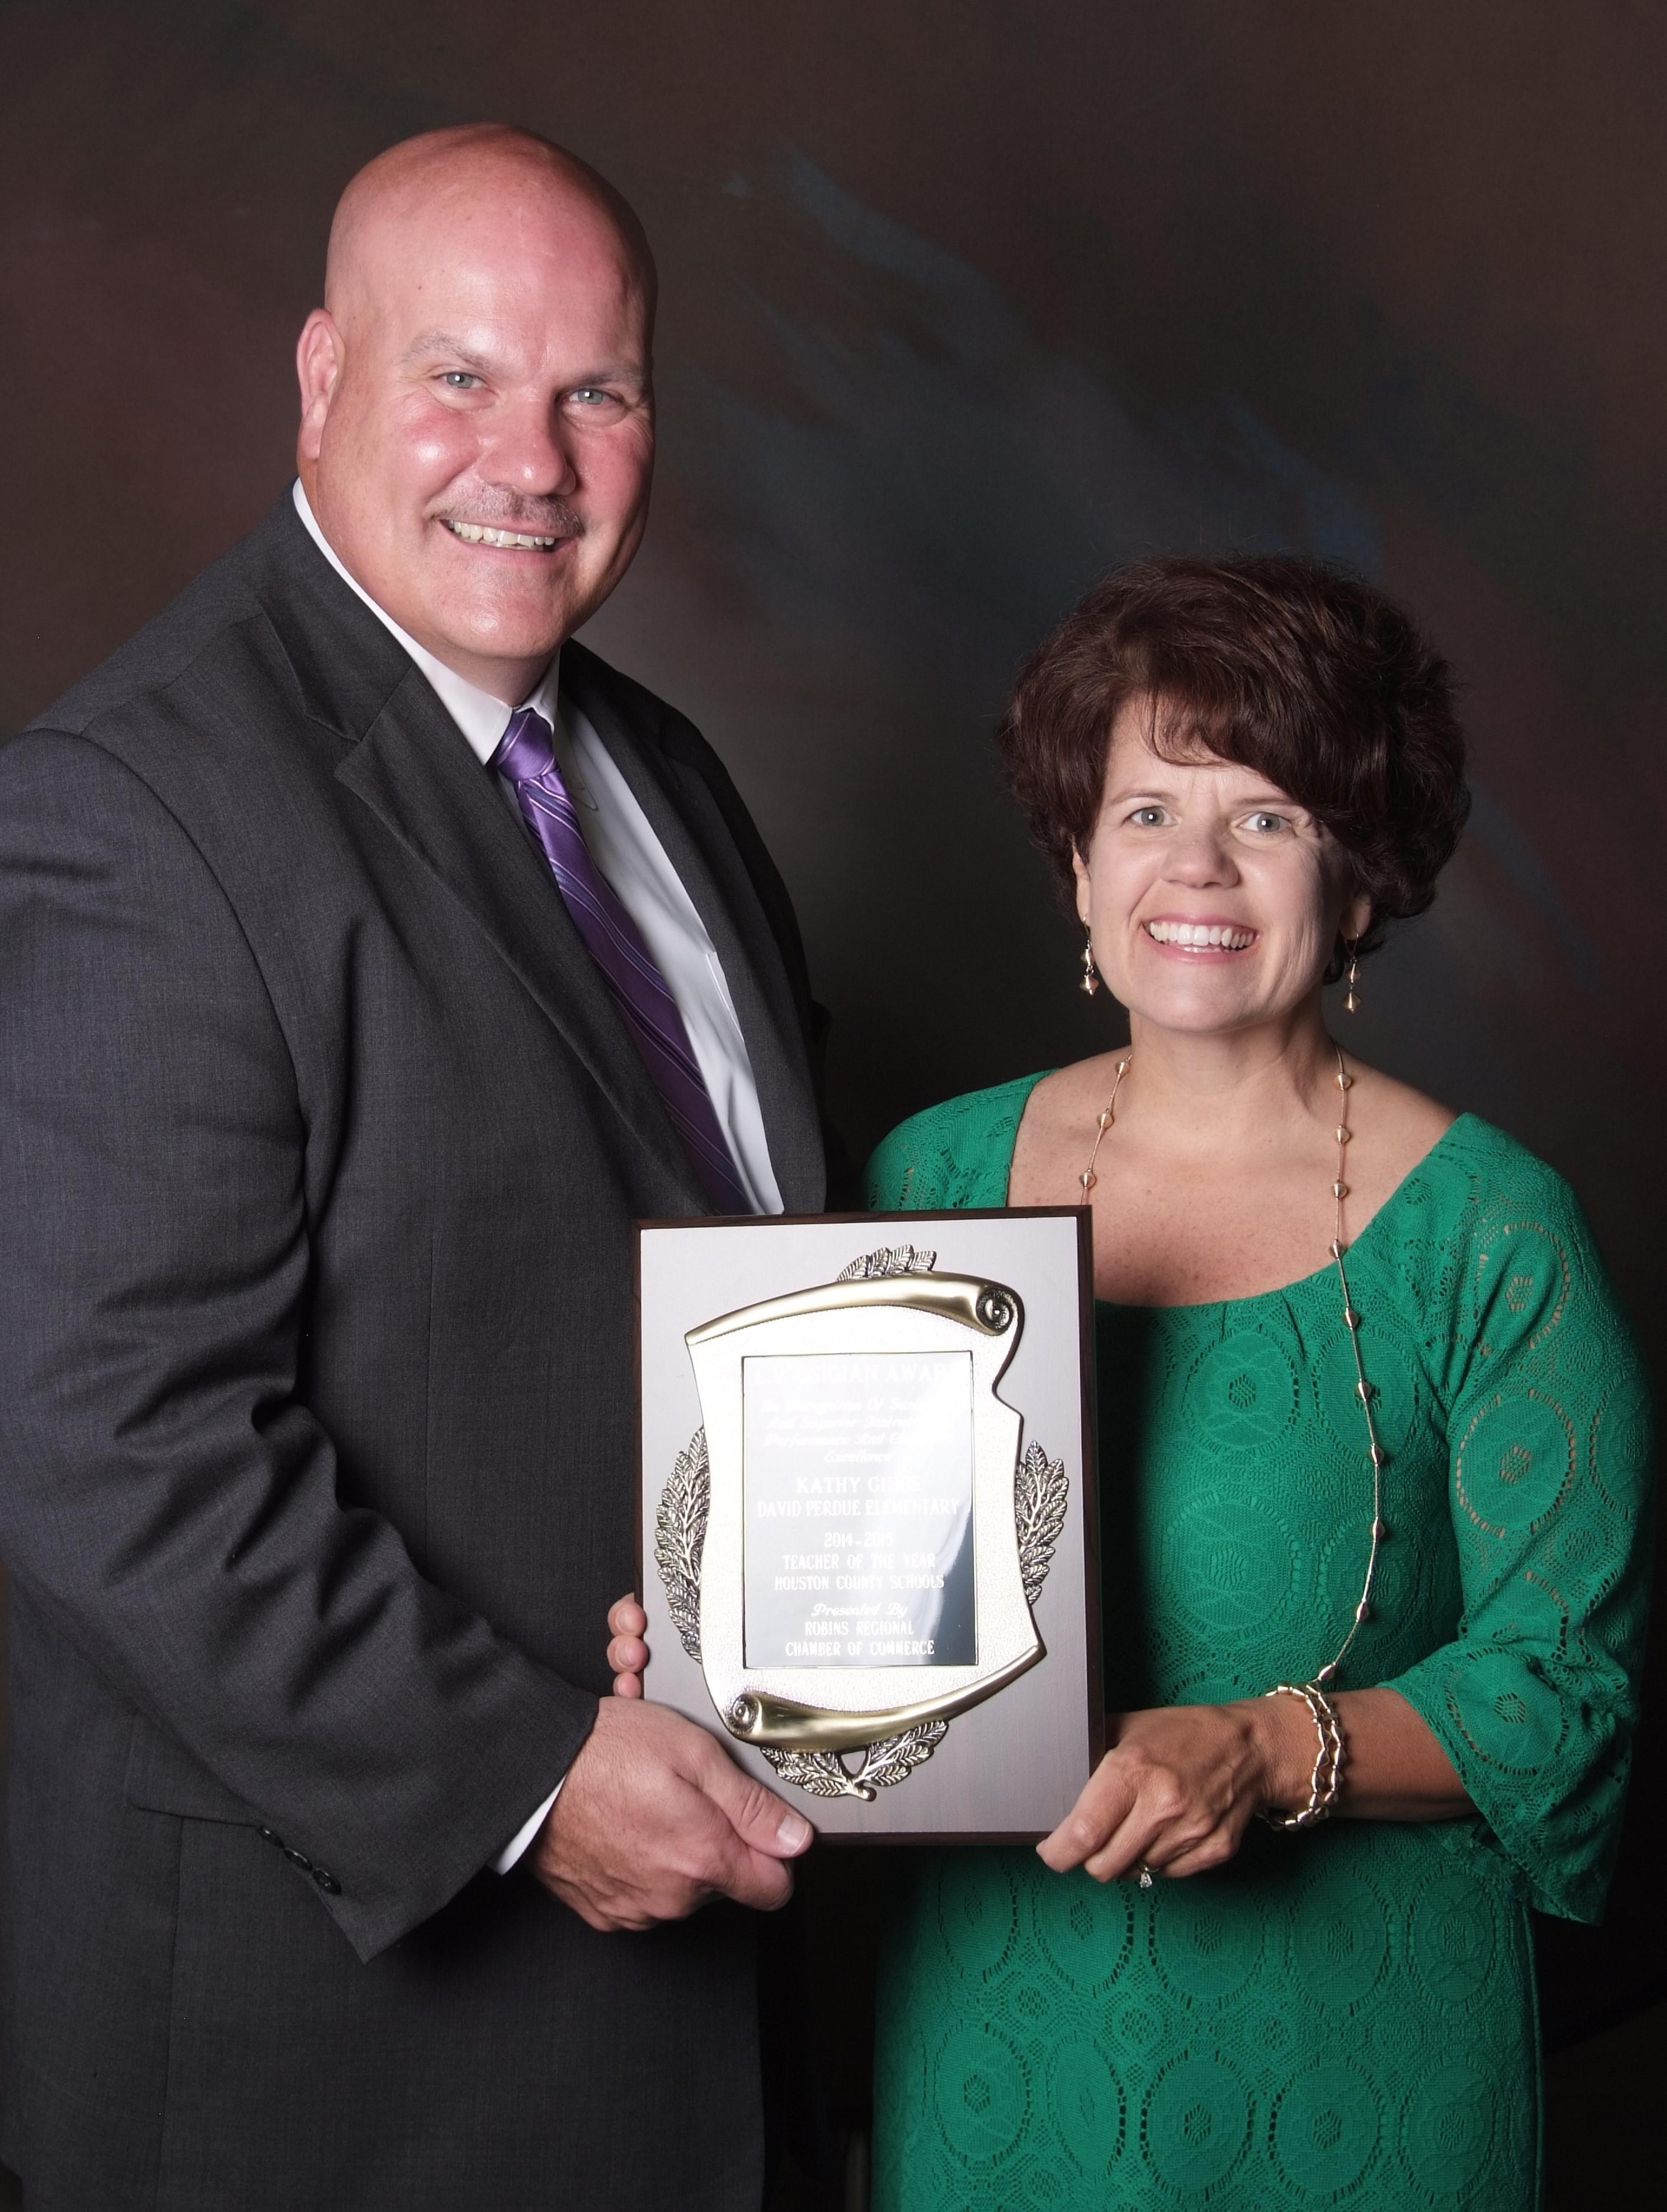 Kathy Gibbs with Superintendent of School Dr. Mark Scott